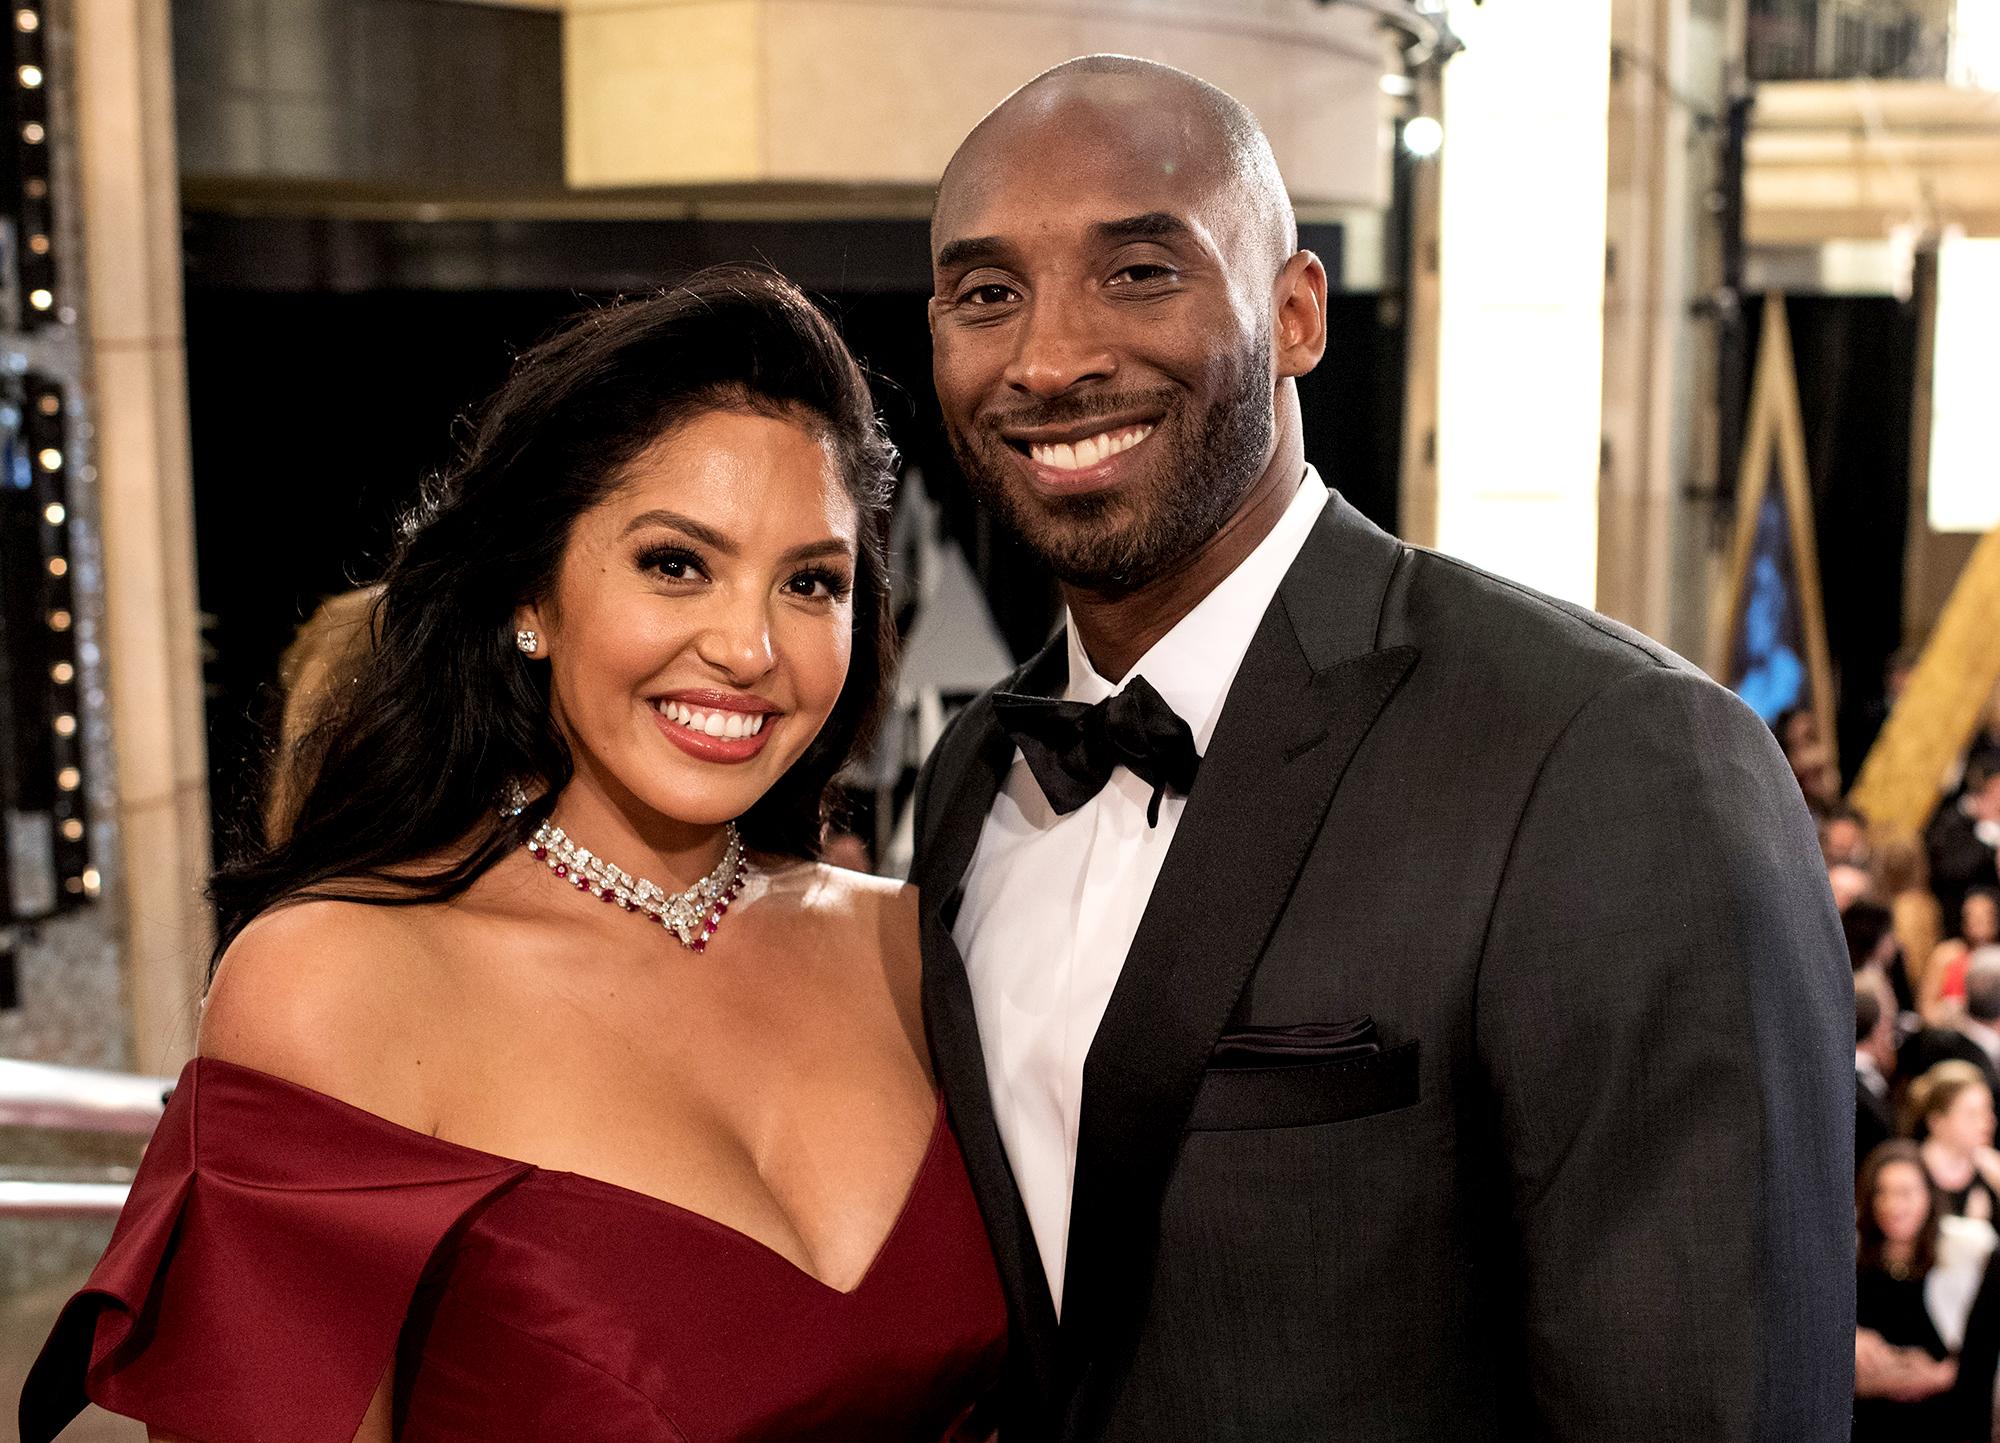 Vanessa-Bryant-Misses-Her-Loving-Husband-Kobe-Bryant